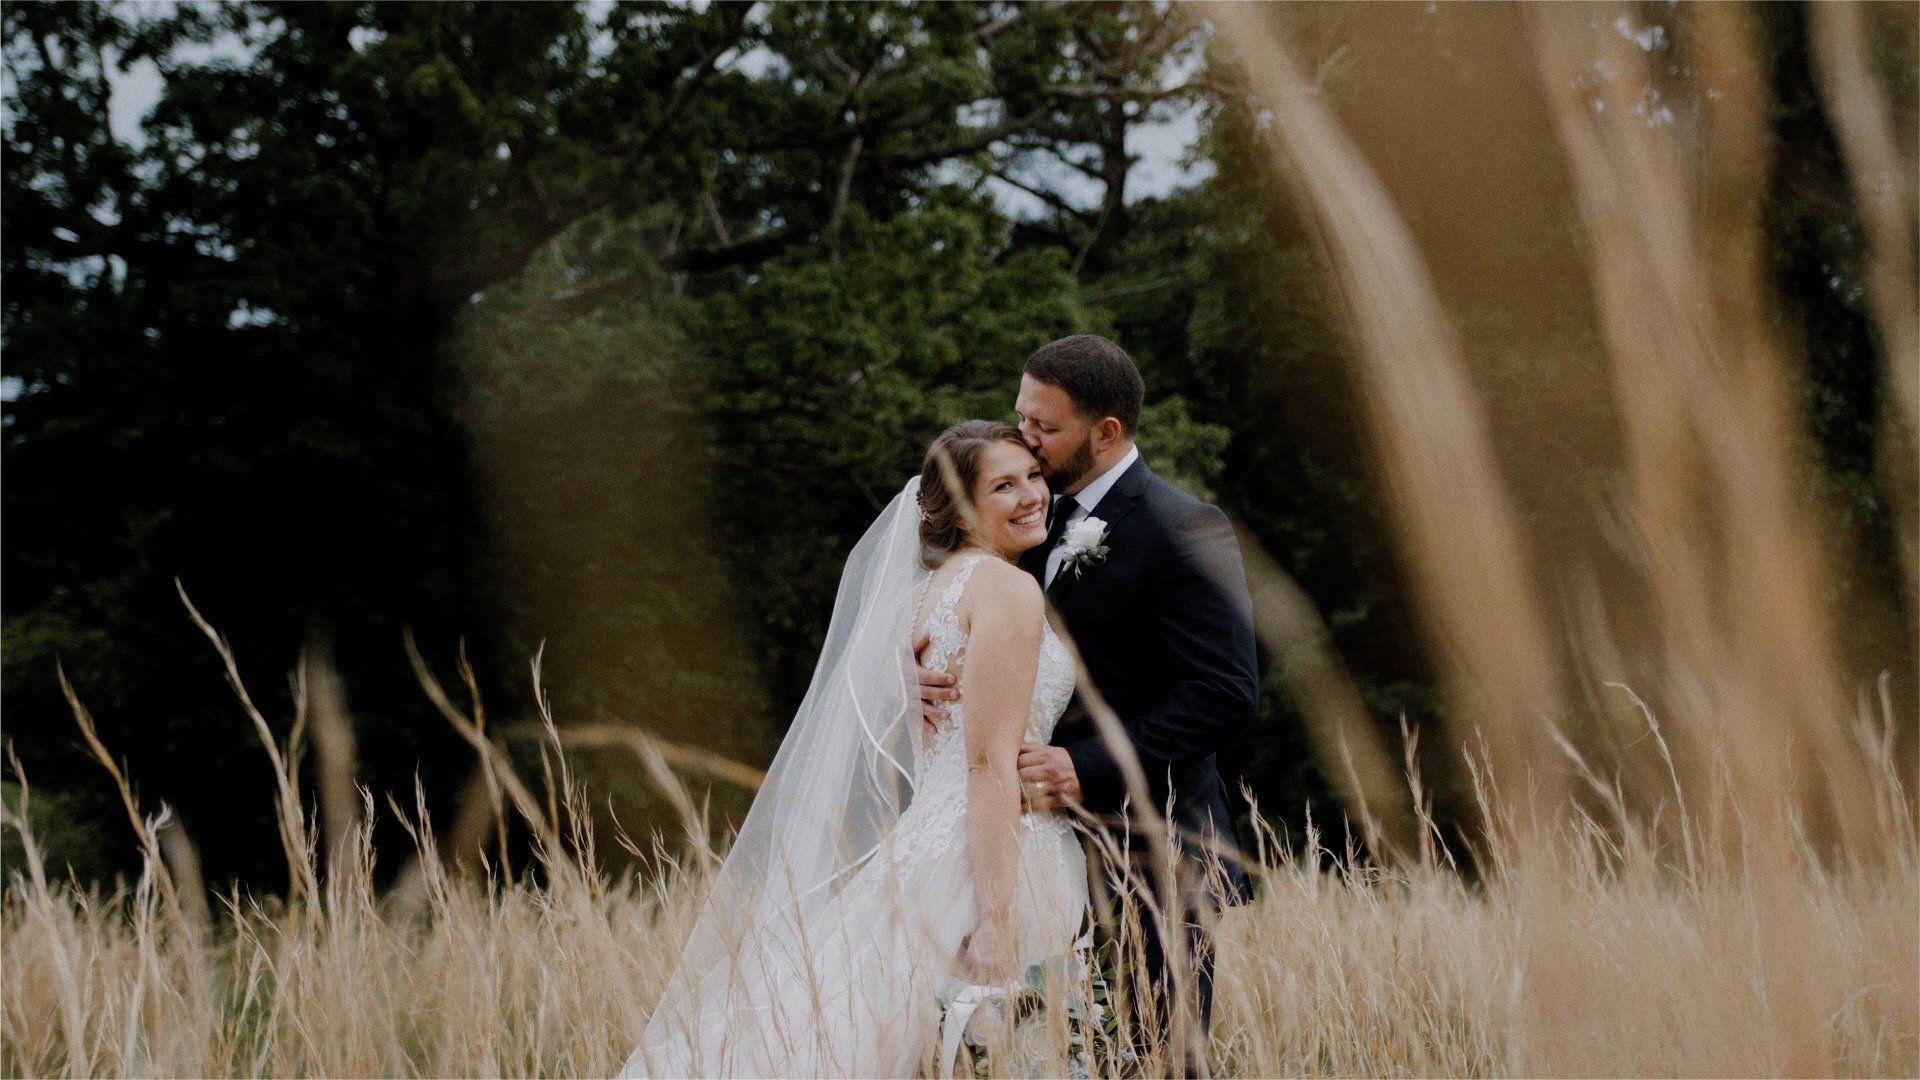 Wedding Dress Alterations Greensboro Nc Beautiful North Carolina Love Stories Tv In 2020 Wedding Dresses Wedding Dress Preservation Wedding Dress Alterations